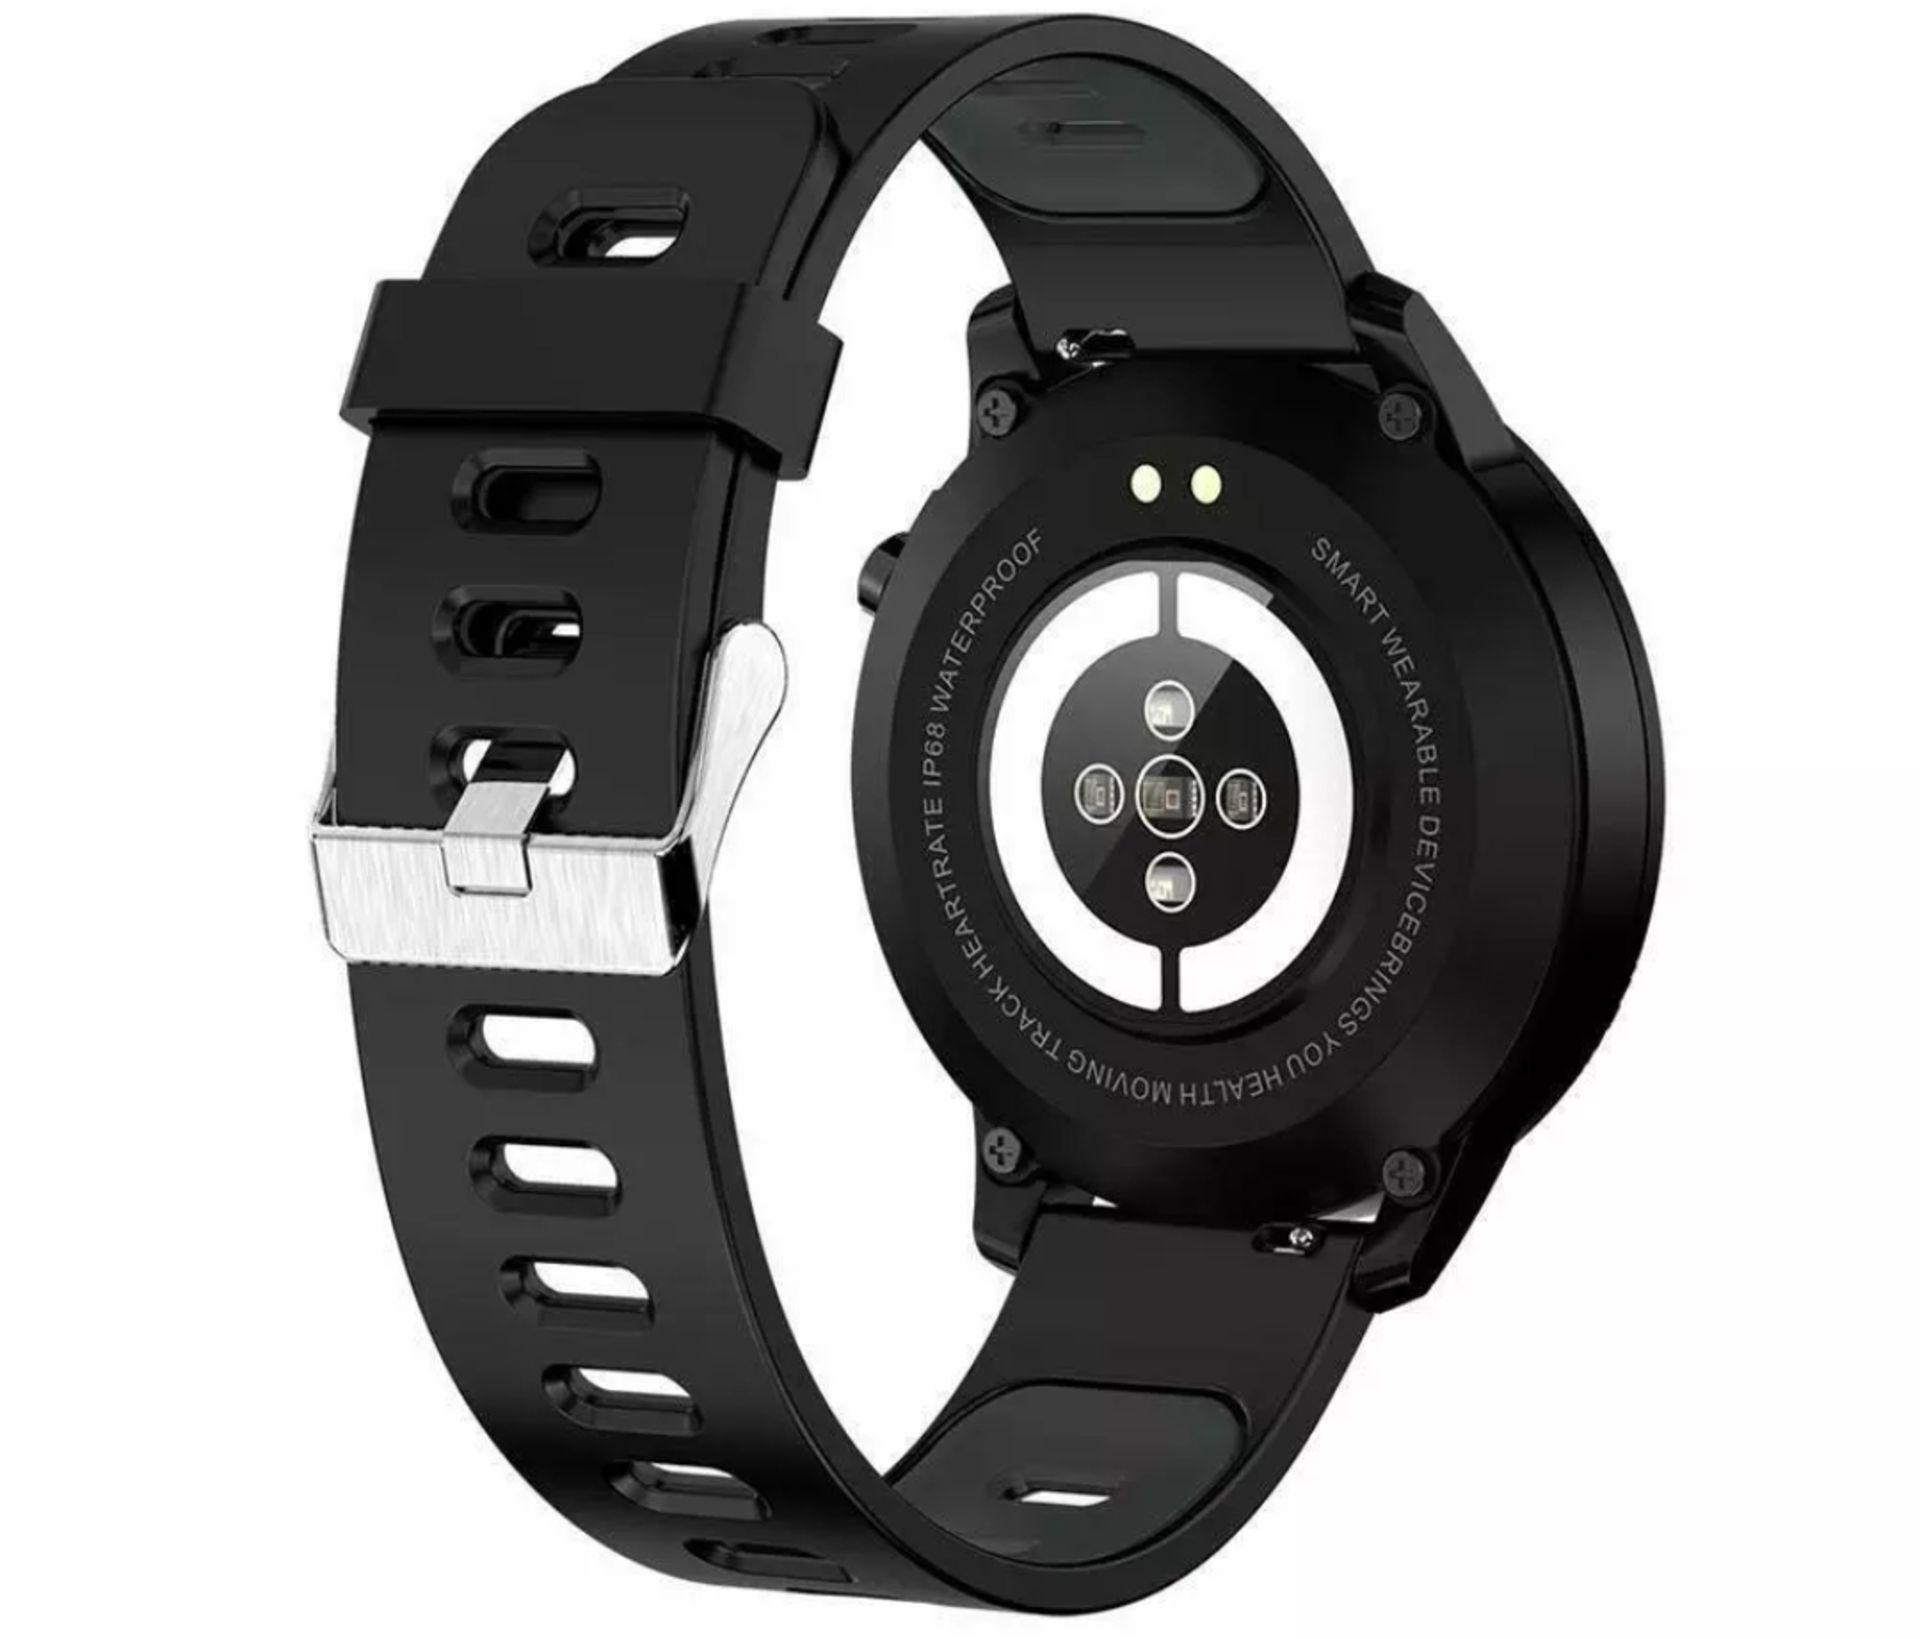 Lot 158 - L8 Smart Watch Blood Pressure Heart Rate Smart Bracelet Fitness Tracker, Red/ Black Strap